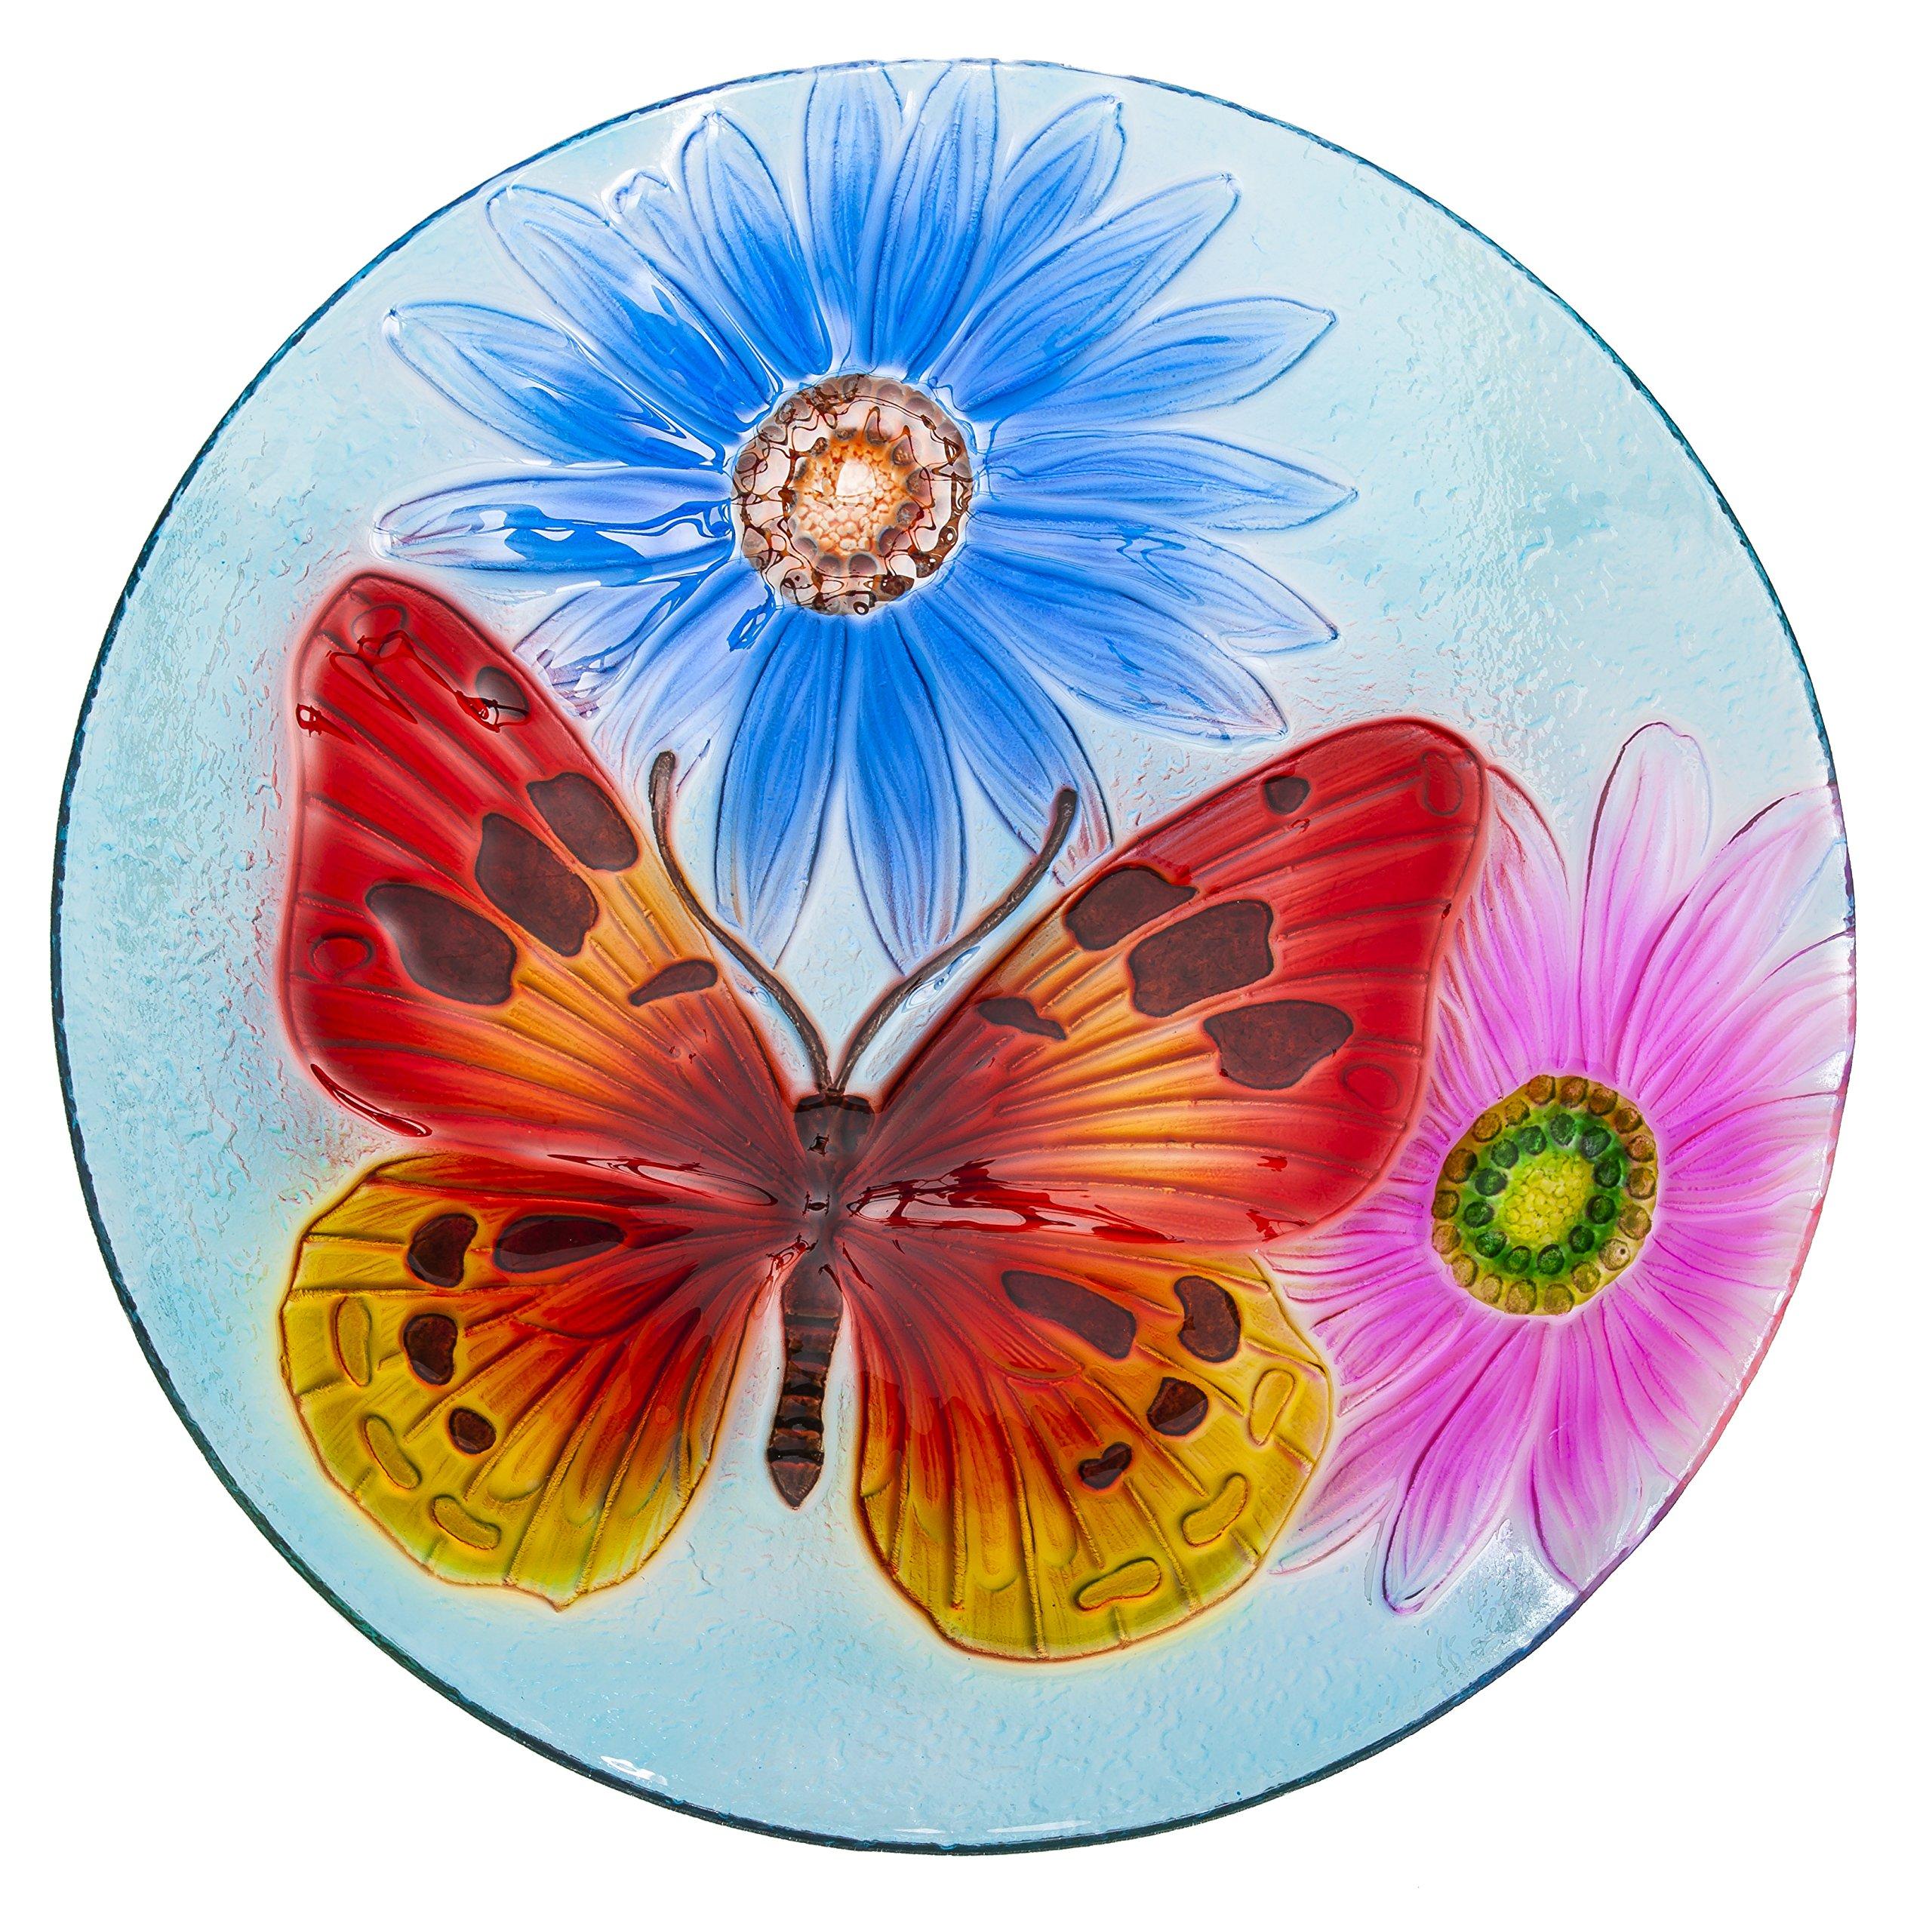 Evergreen Graceful Butterfly Glass Birdbath Bowl, 18 inches